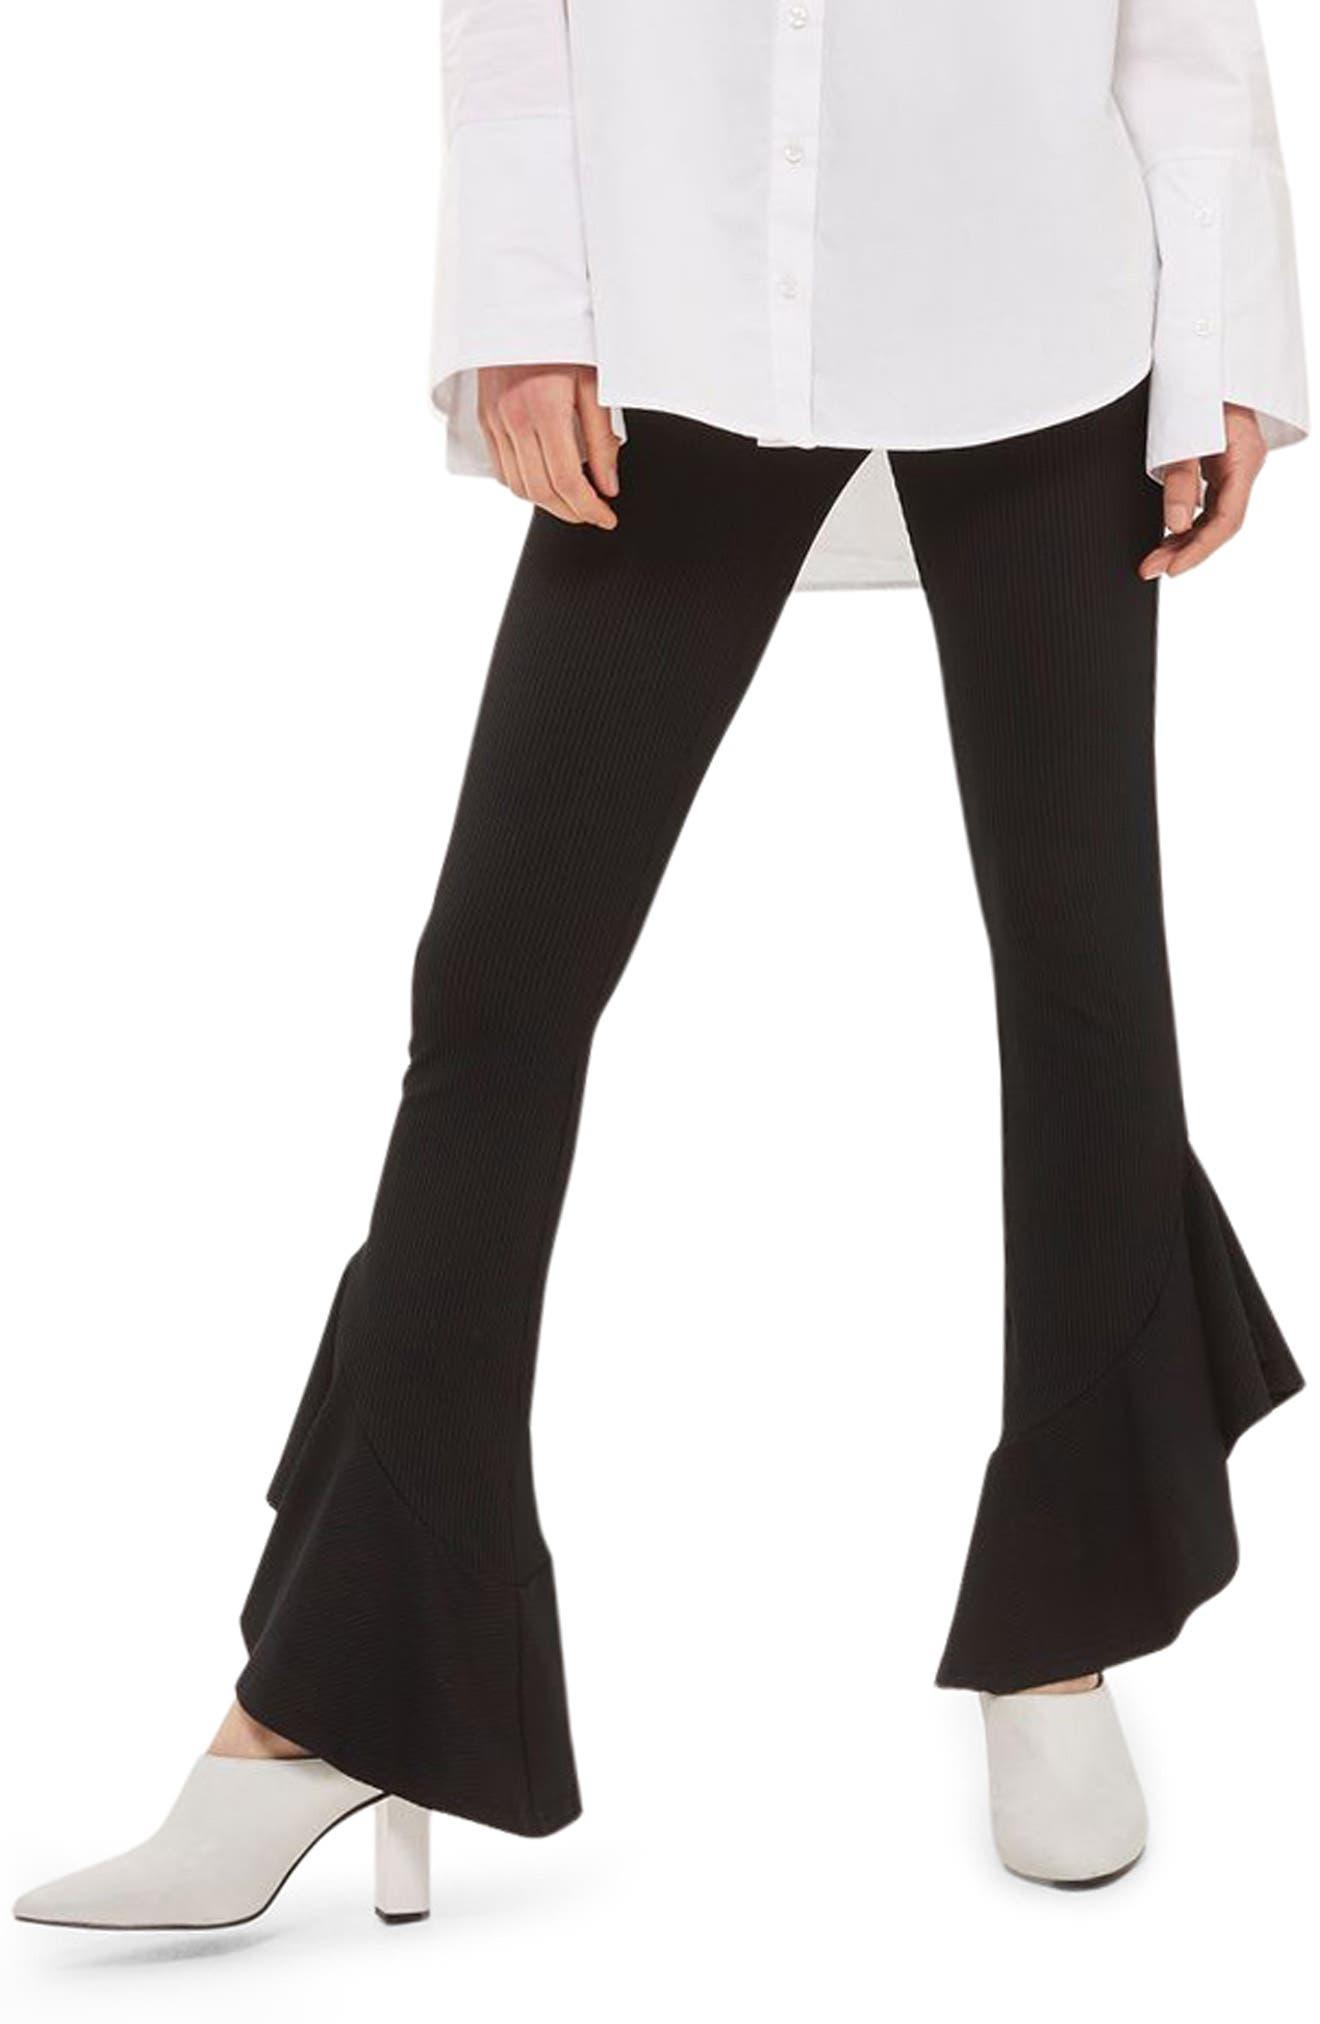 Mermaid Frill Flare Trousers,                             Main thumbnail 1, color,                             Black